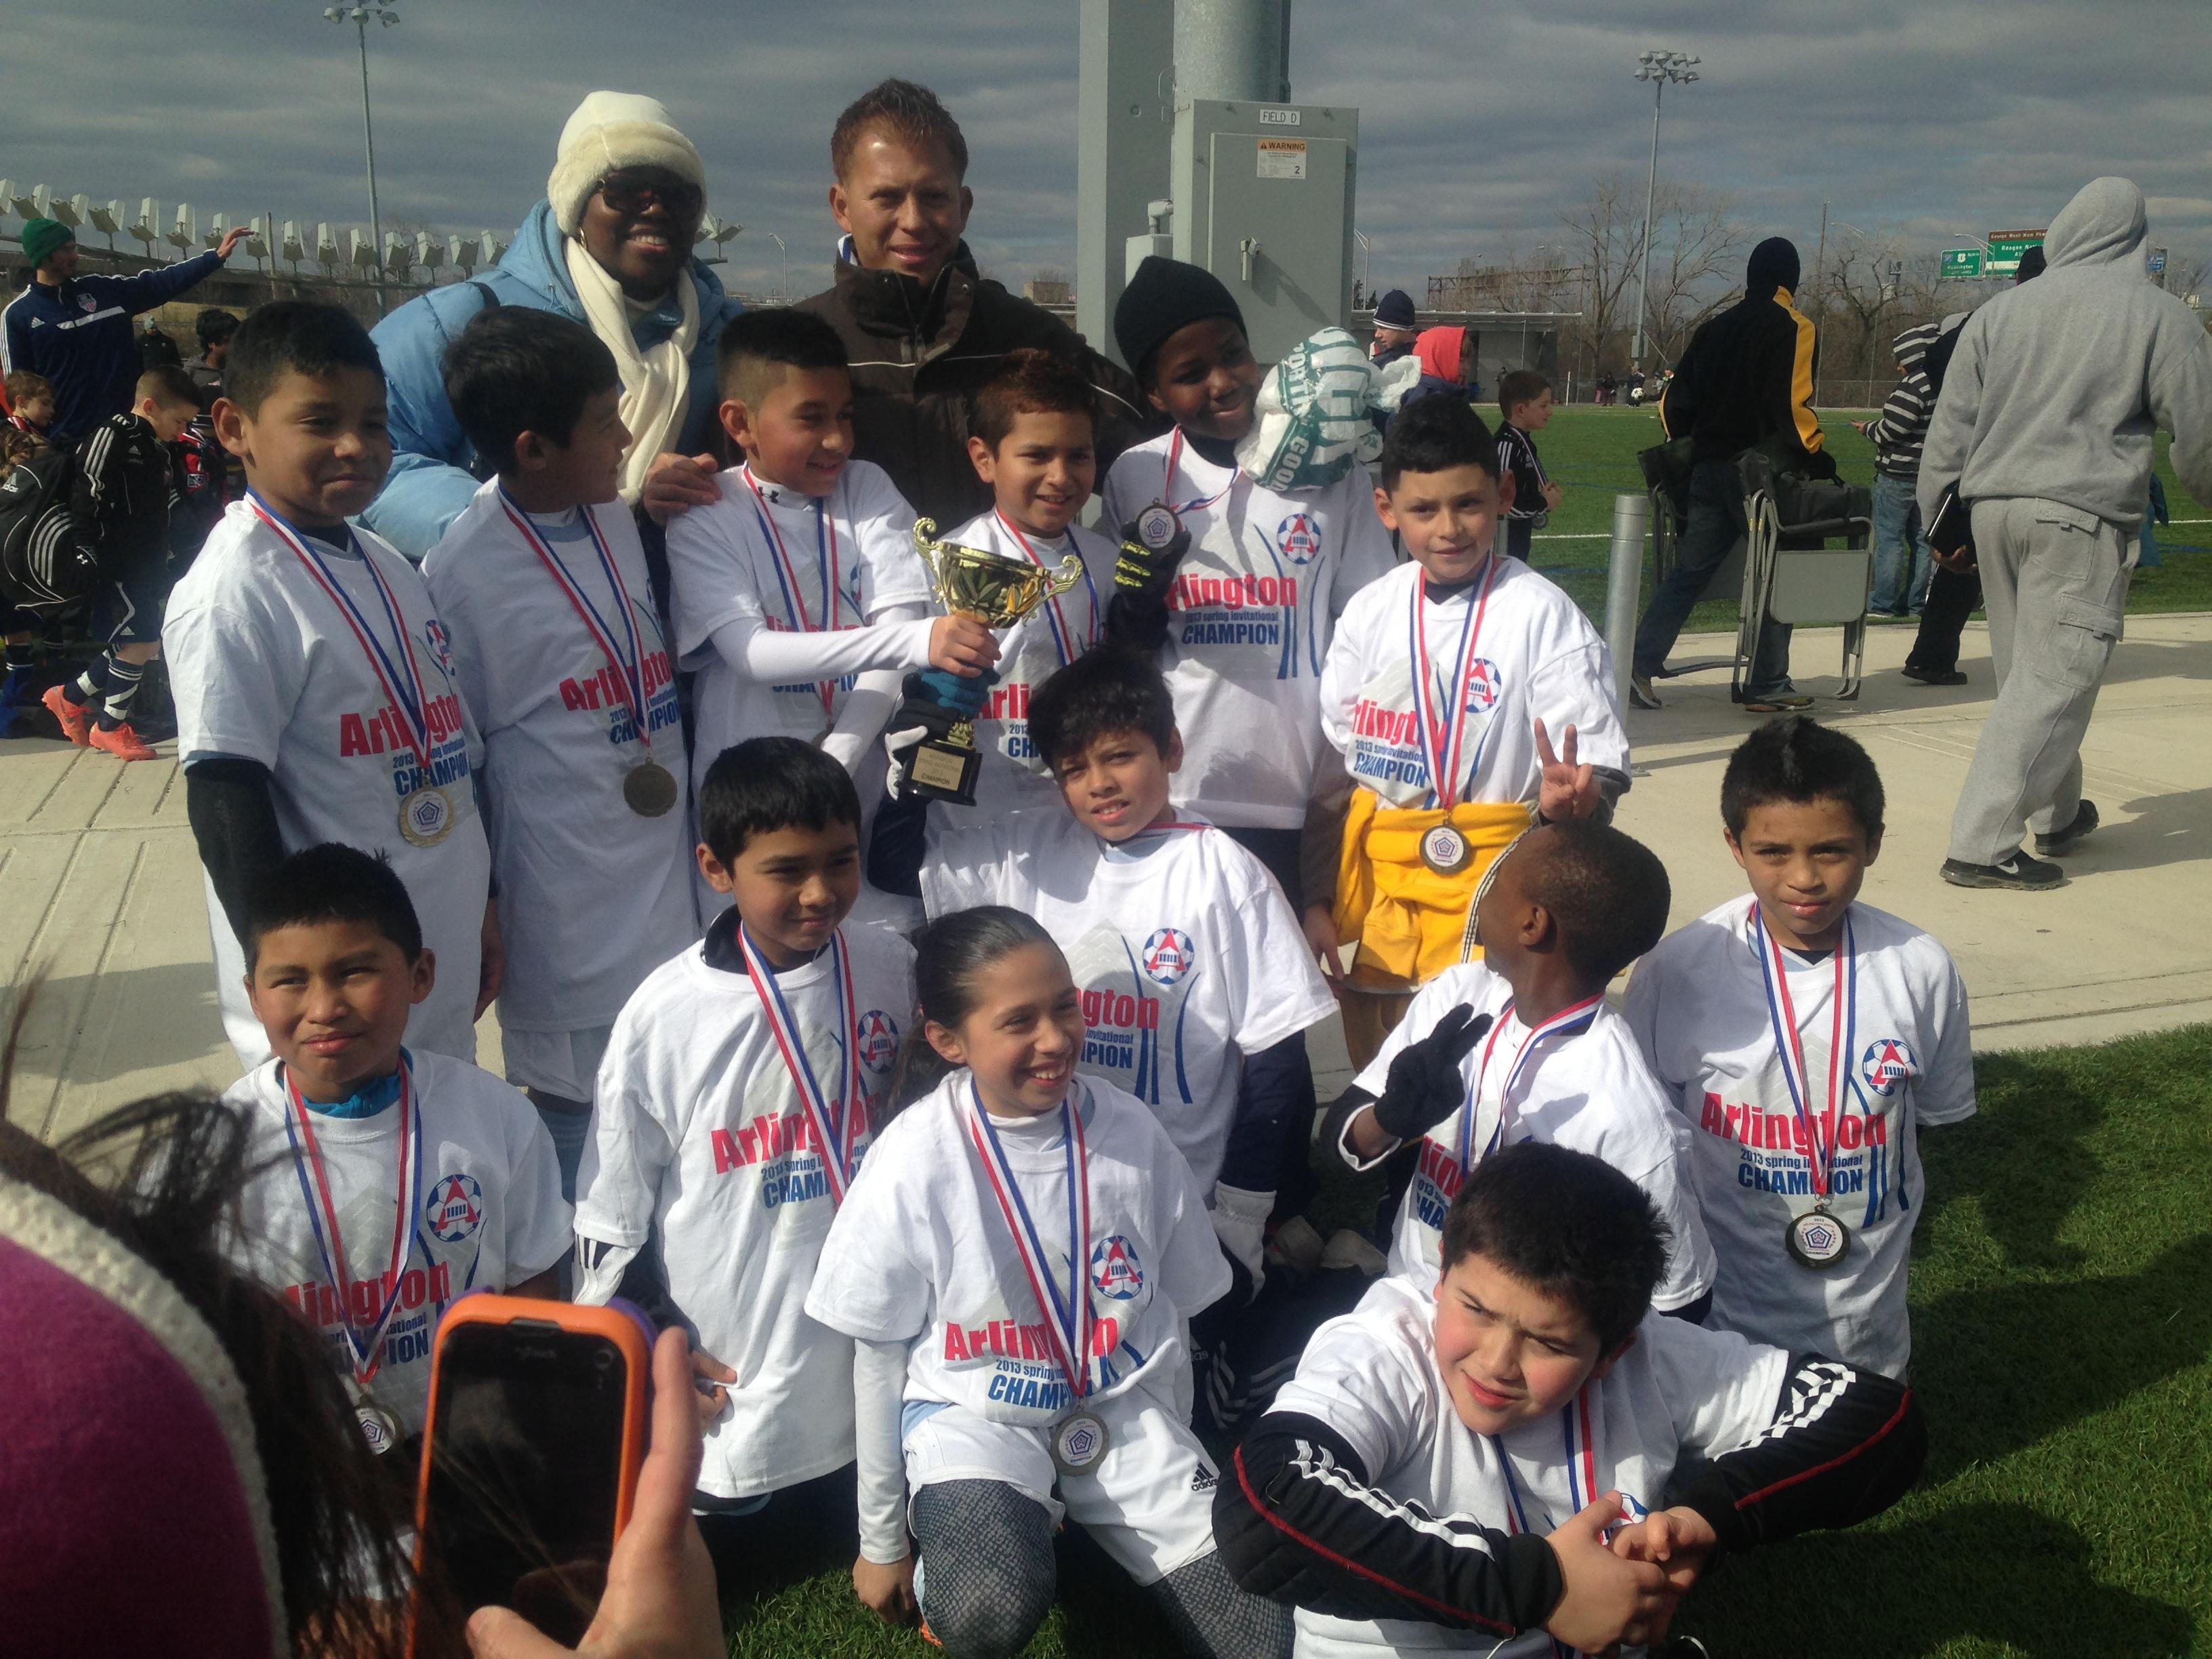 2013 Arlington VA - Champions